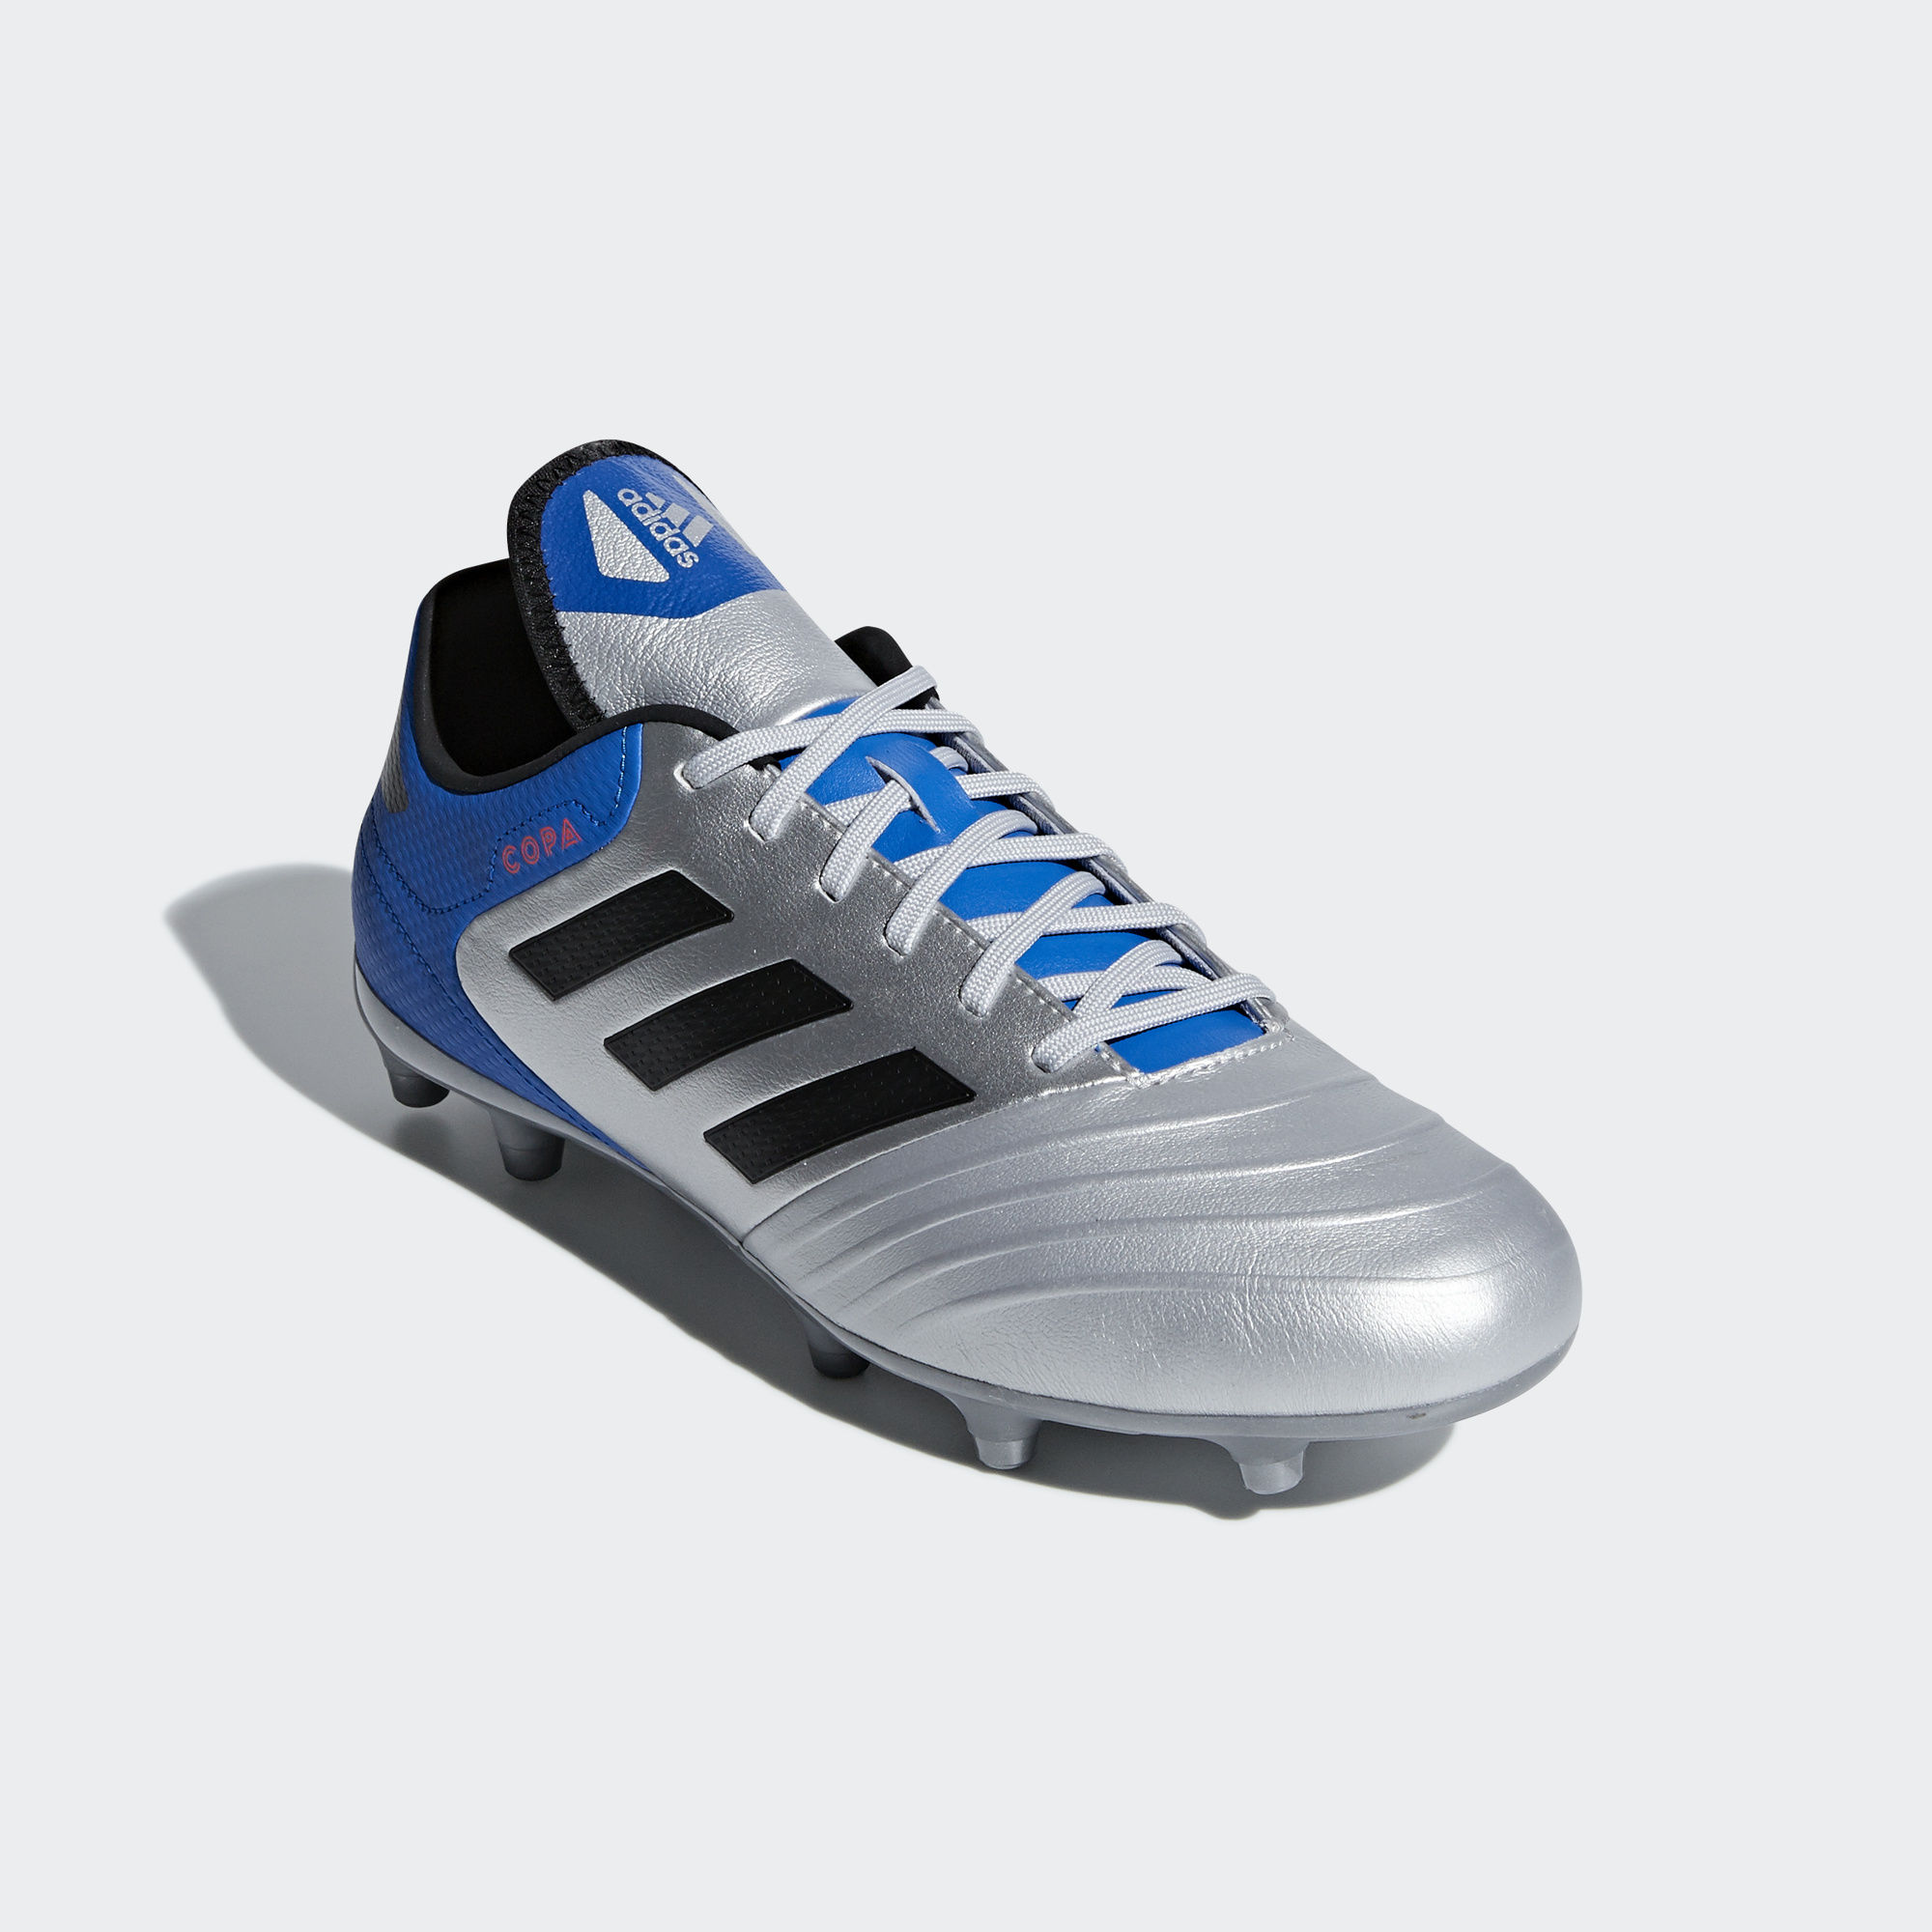 Football shoes Adidas Scarpe Calcio Copa Grigio Silver 18.3 FG 2018 Vera  Pelle 4 4 di 9 ... 2d6337ae2be